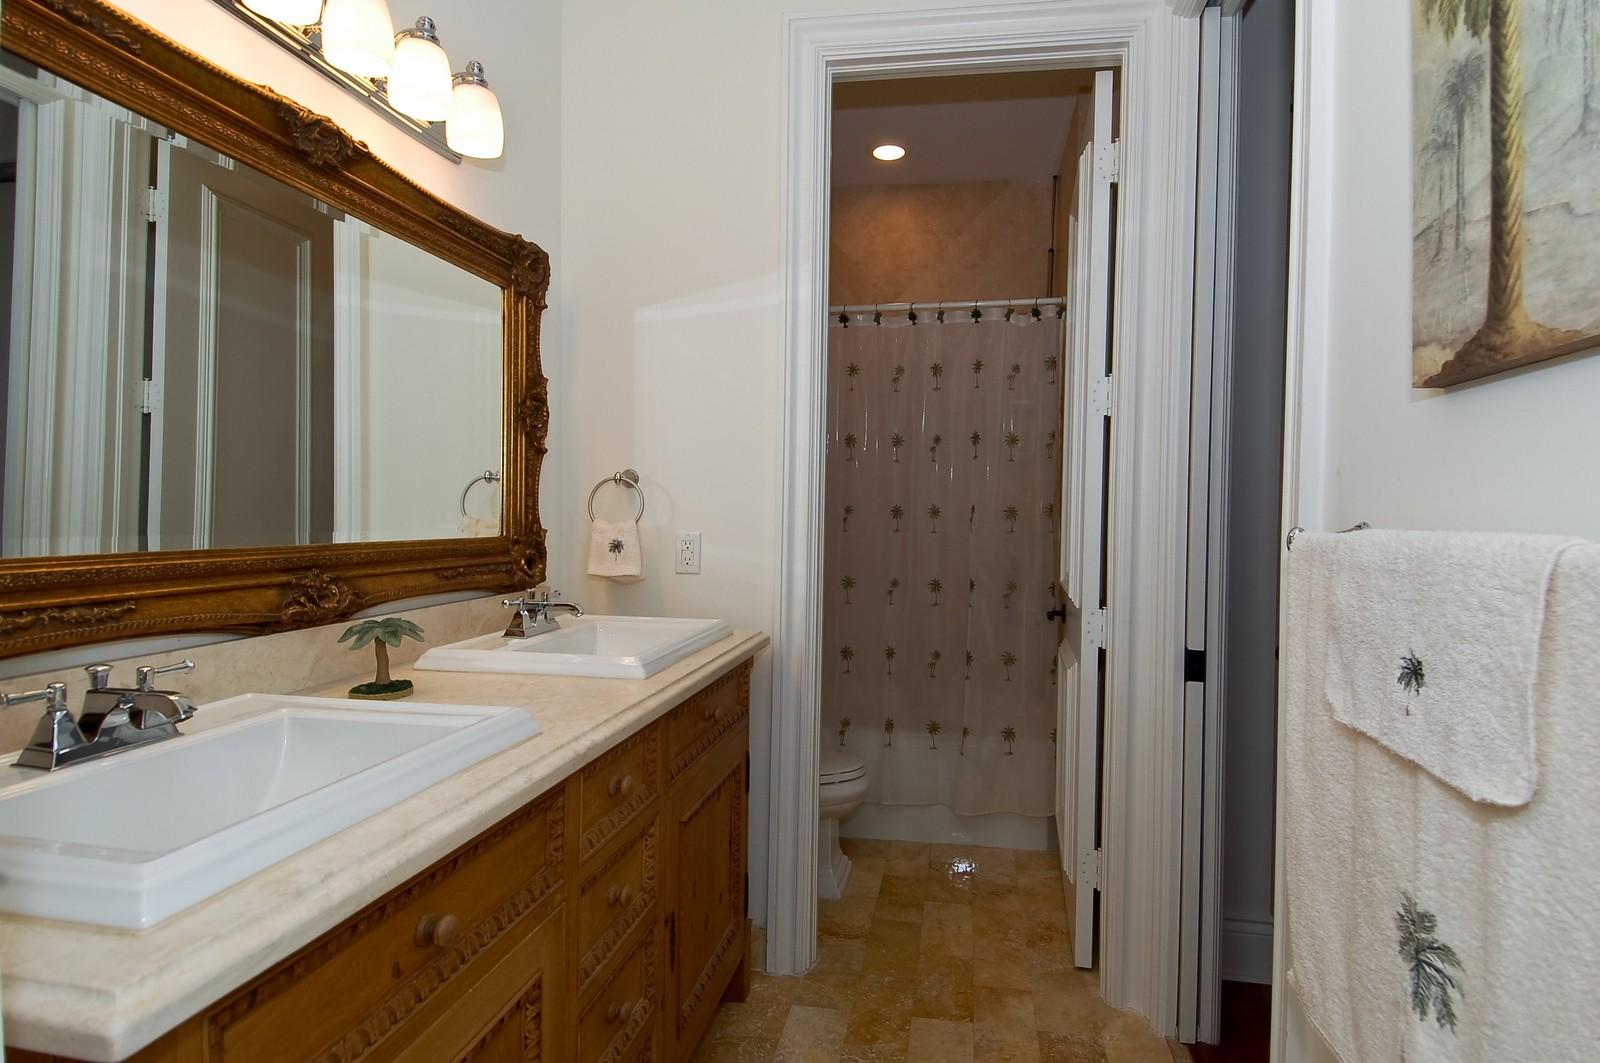 Real Estate Photography - 355 NE 3rd Ct, Boca Raton, FL, 33432 - Bathroom